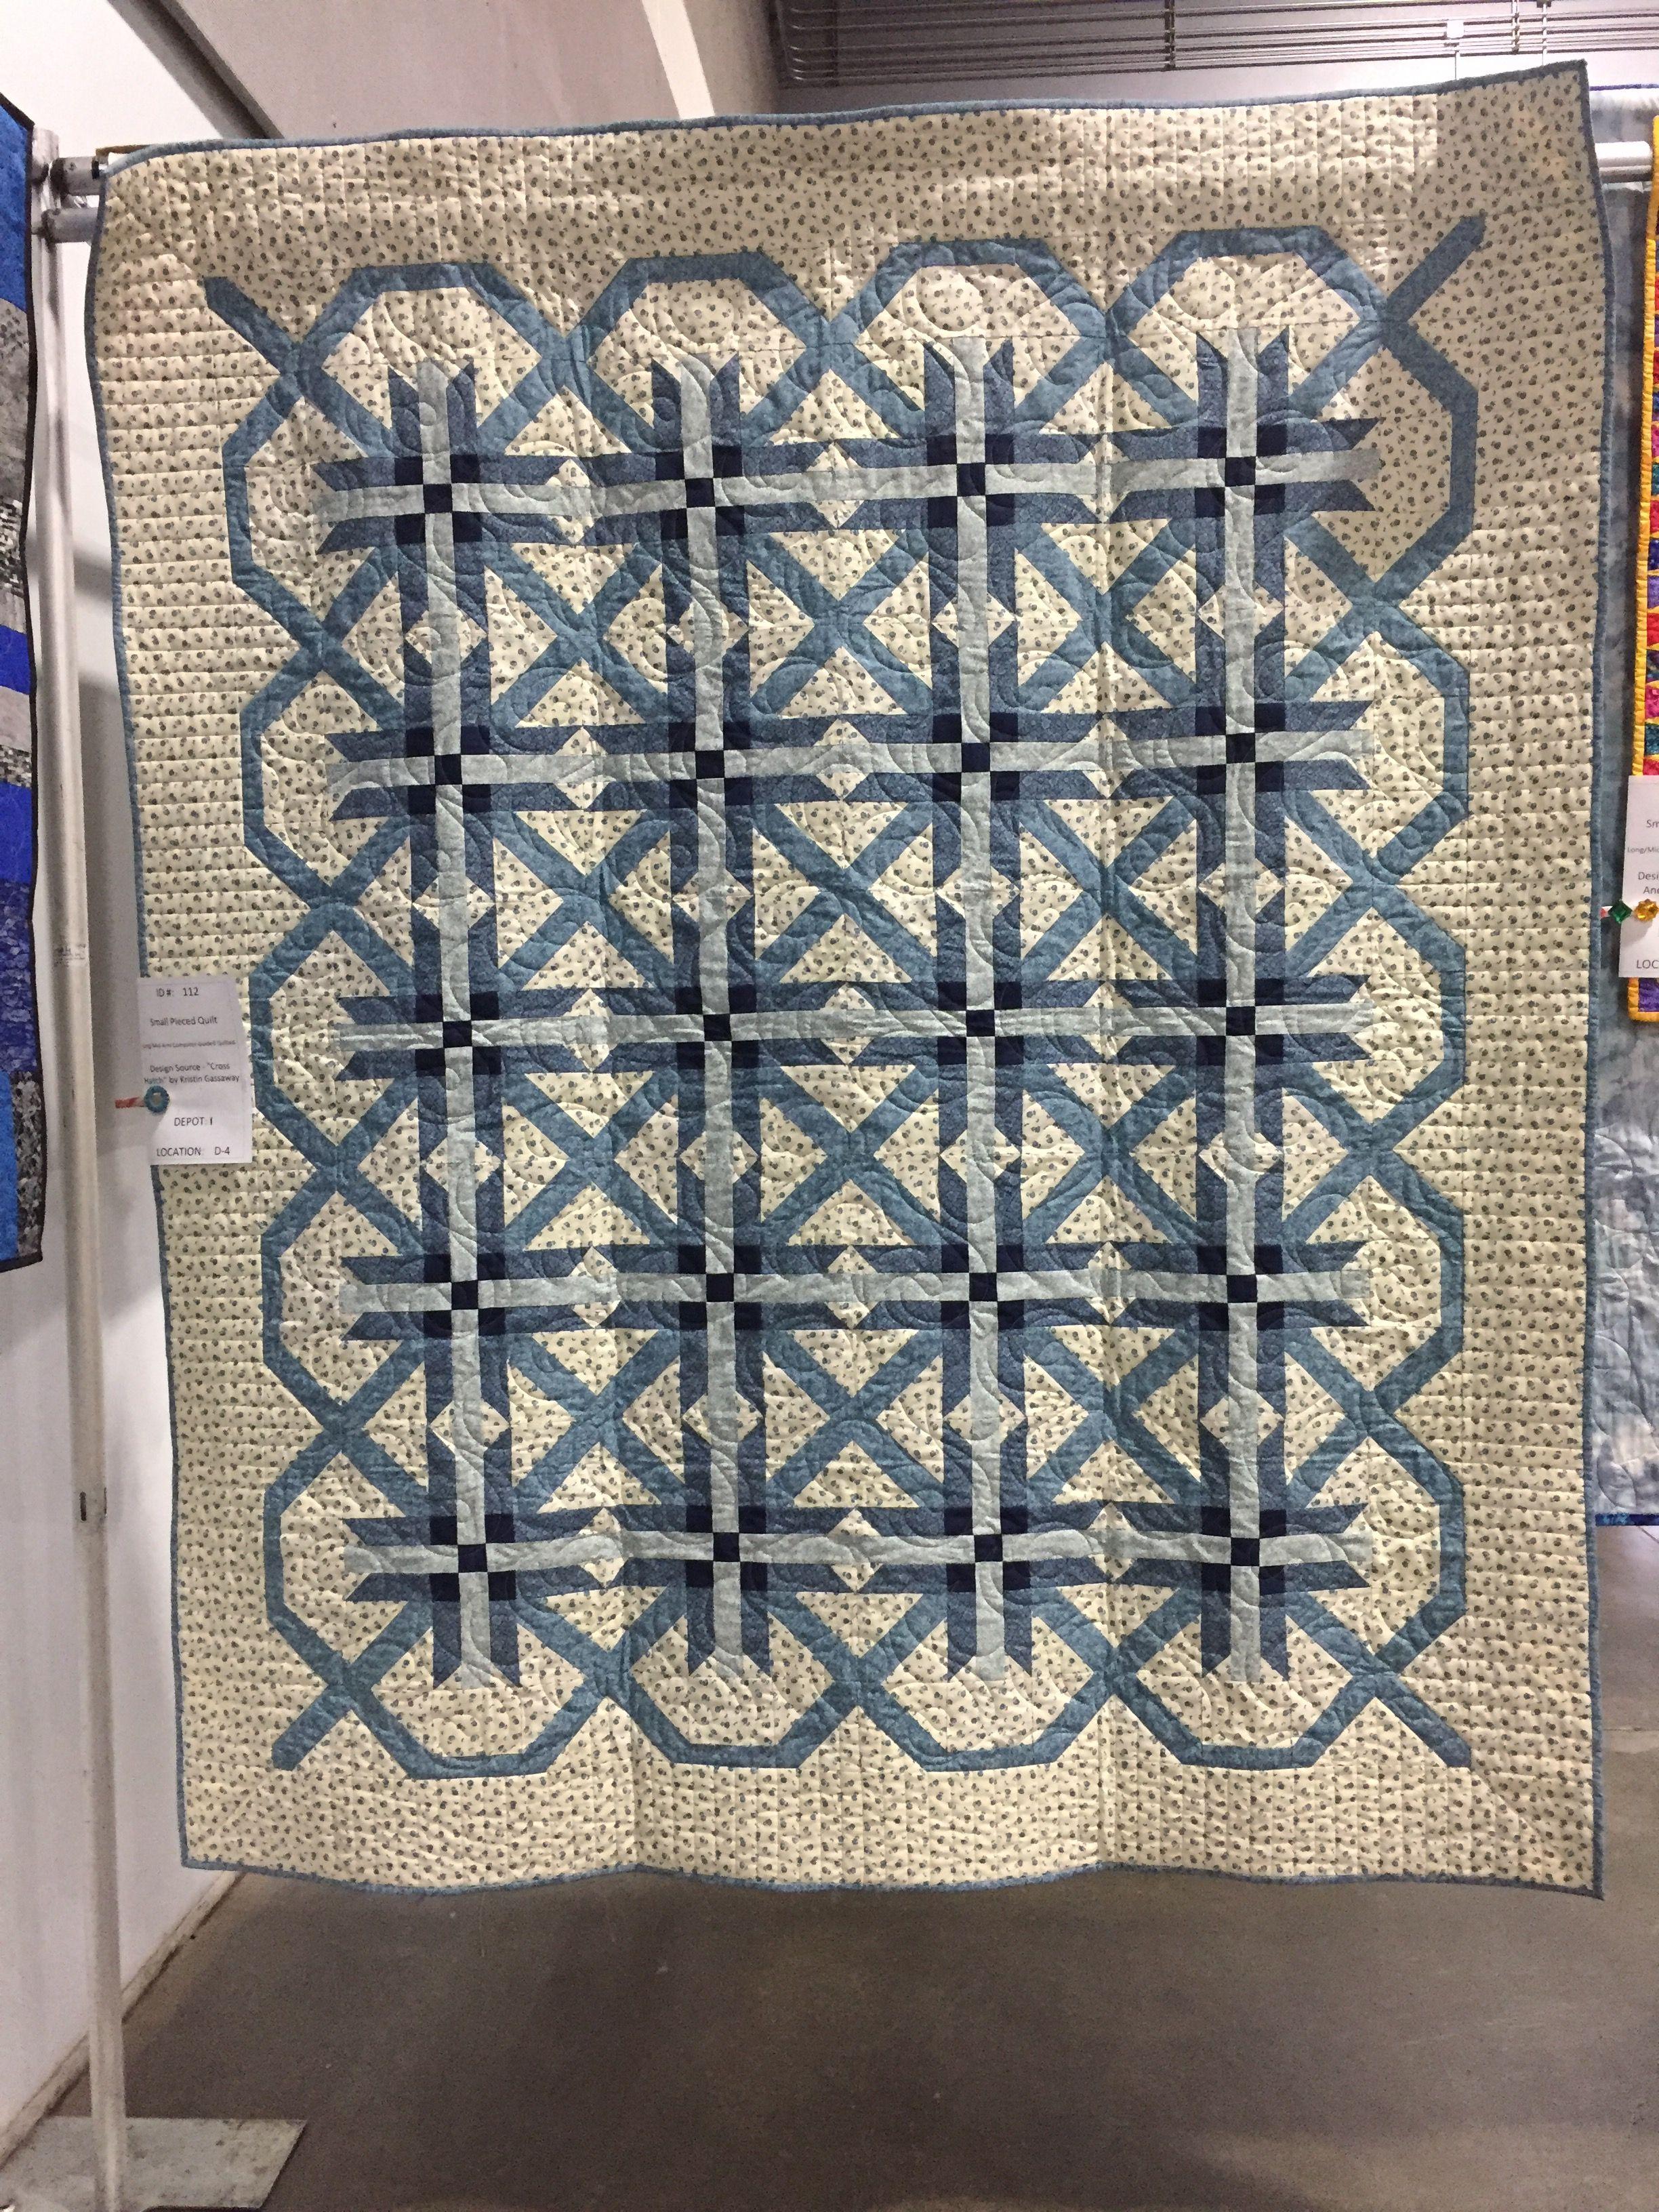 I slightly modified Kristin Gassaway's quilt pattern